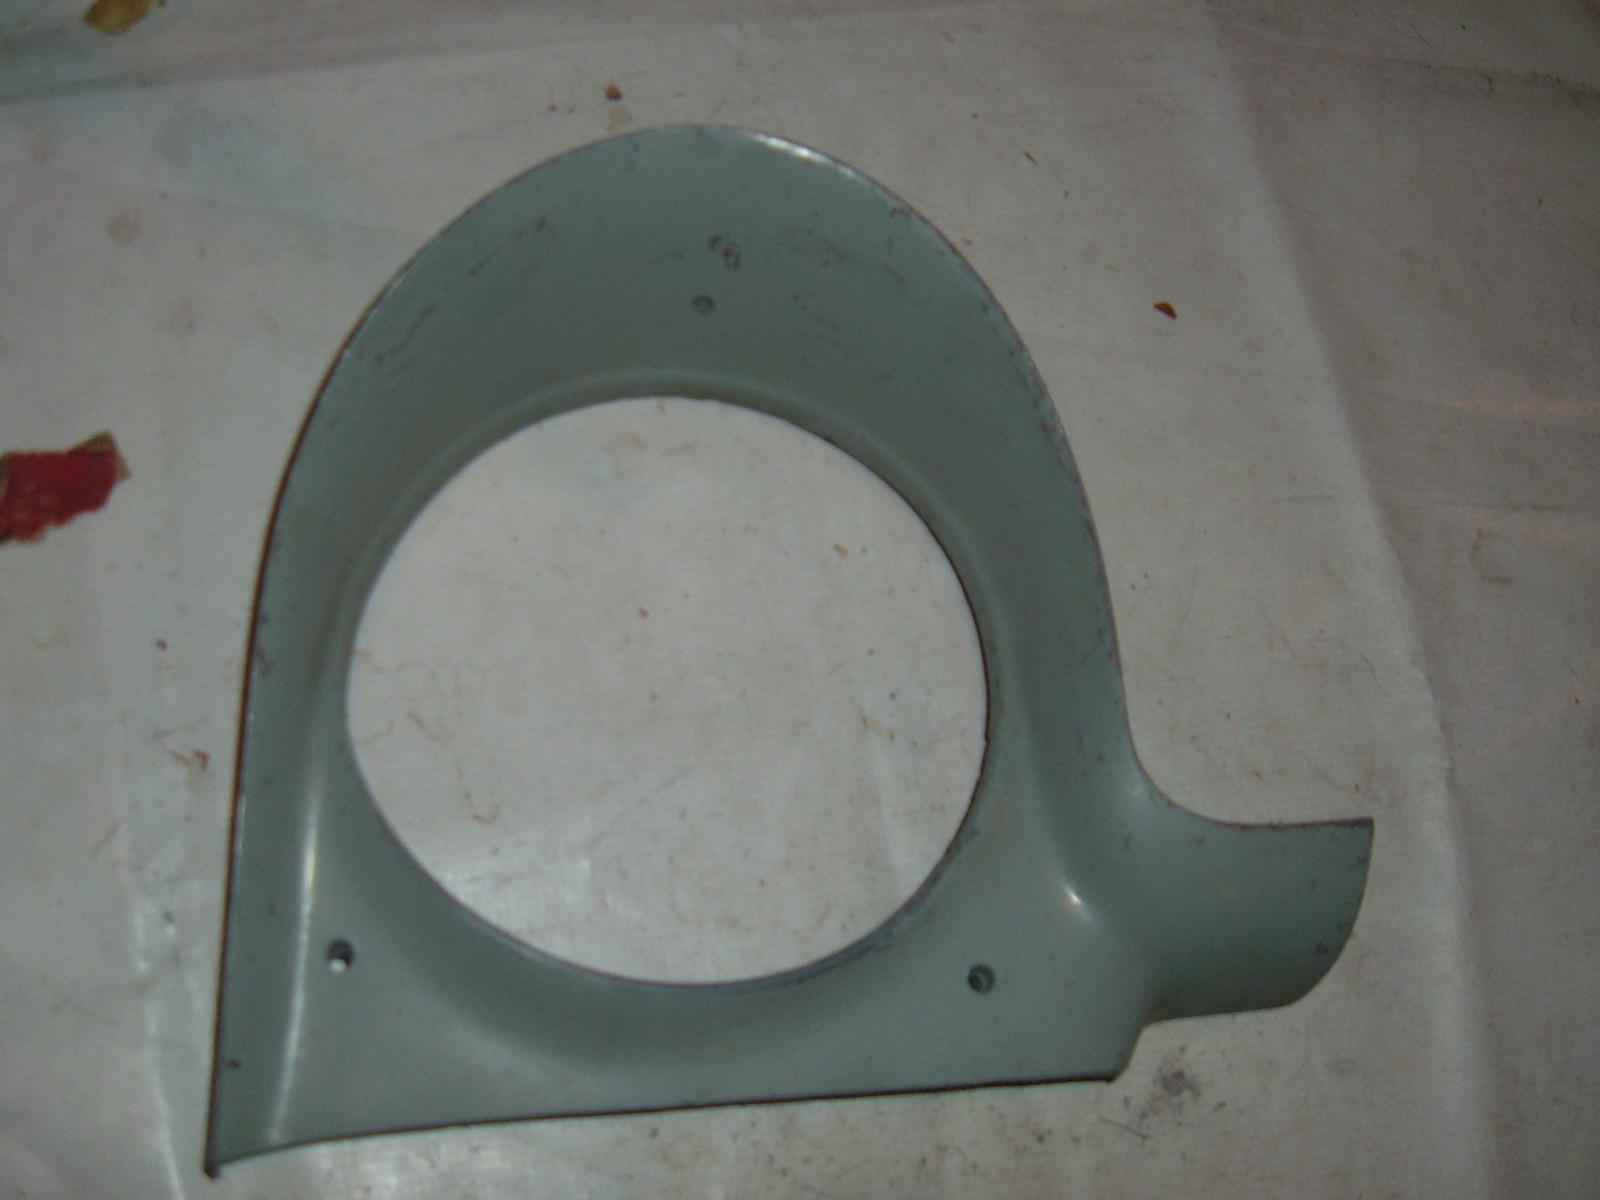 1956 plymouth headlight bezel # 1604796 (z 1604796)